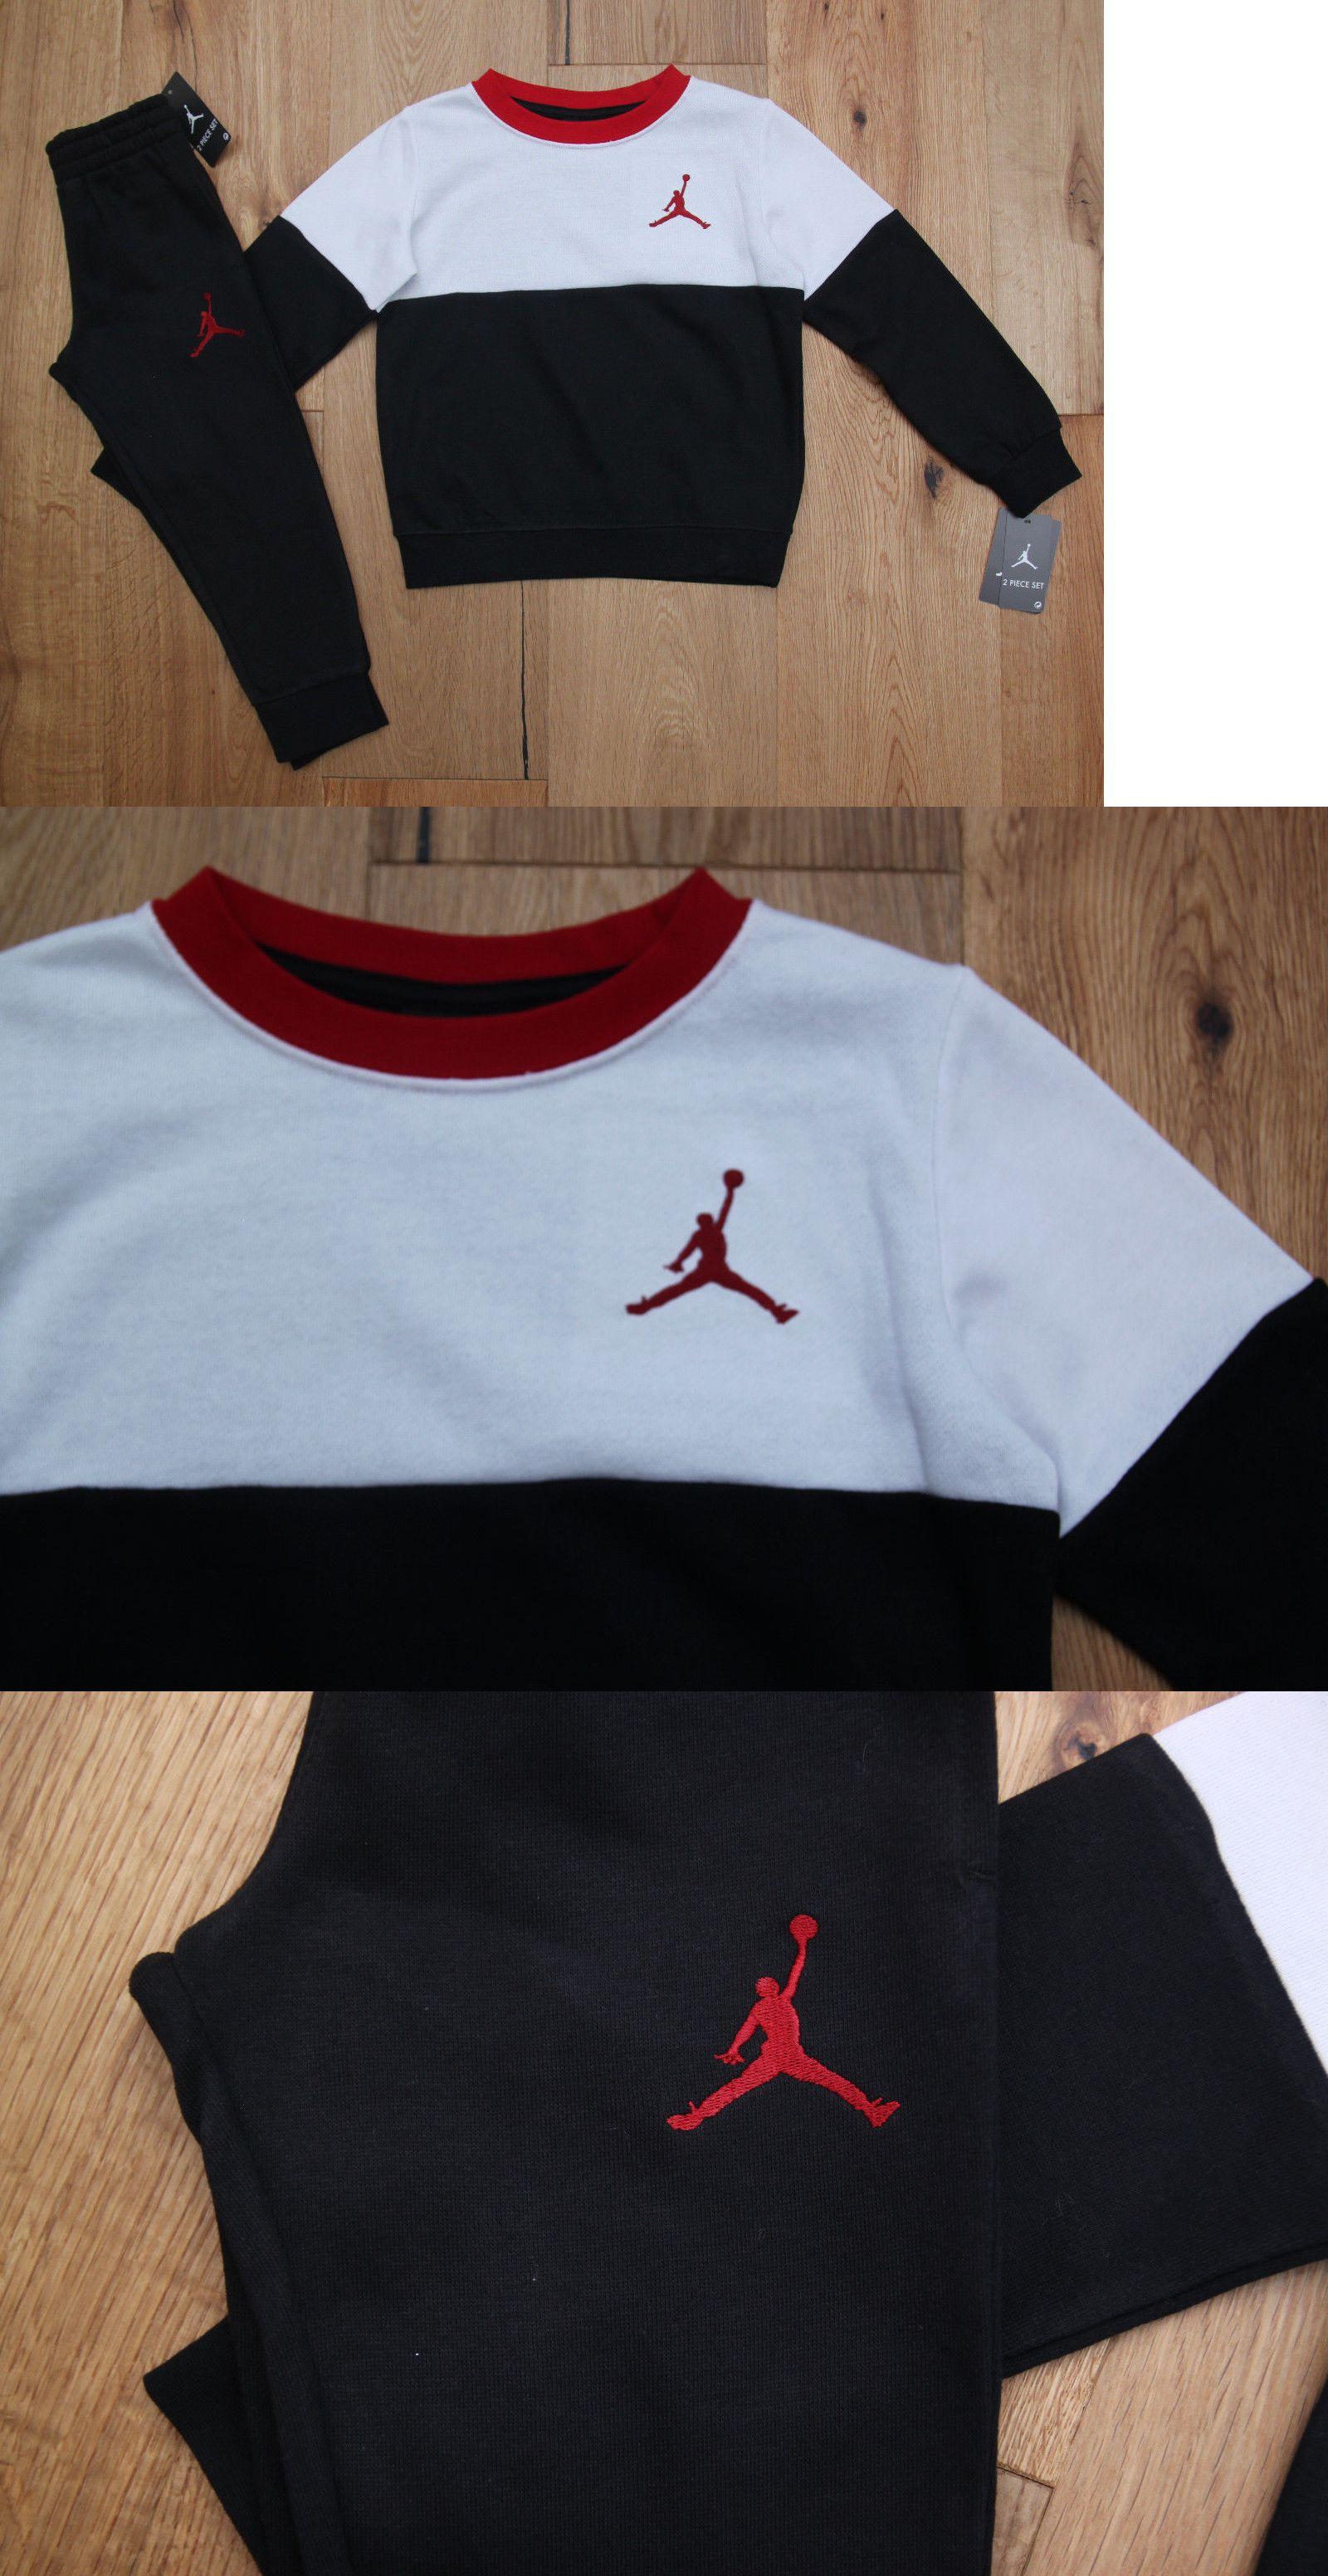 3ac25724e380 Outfits and Sets 147333  Air Jordan Toddler Boy 2 Piece Jogging Set~ Sweatsuit~Black